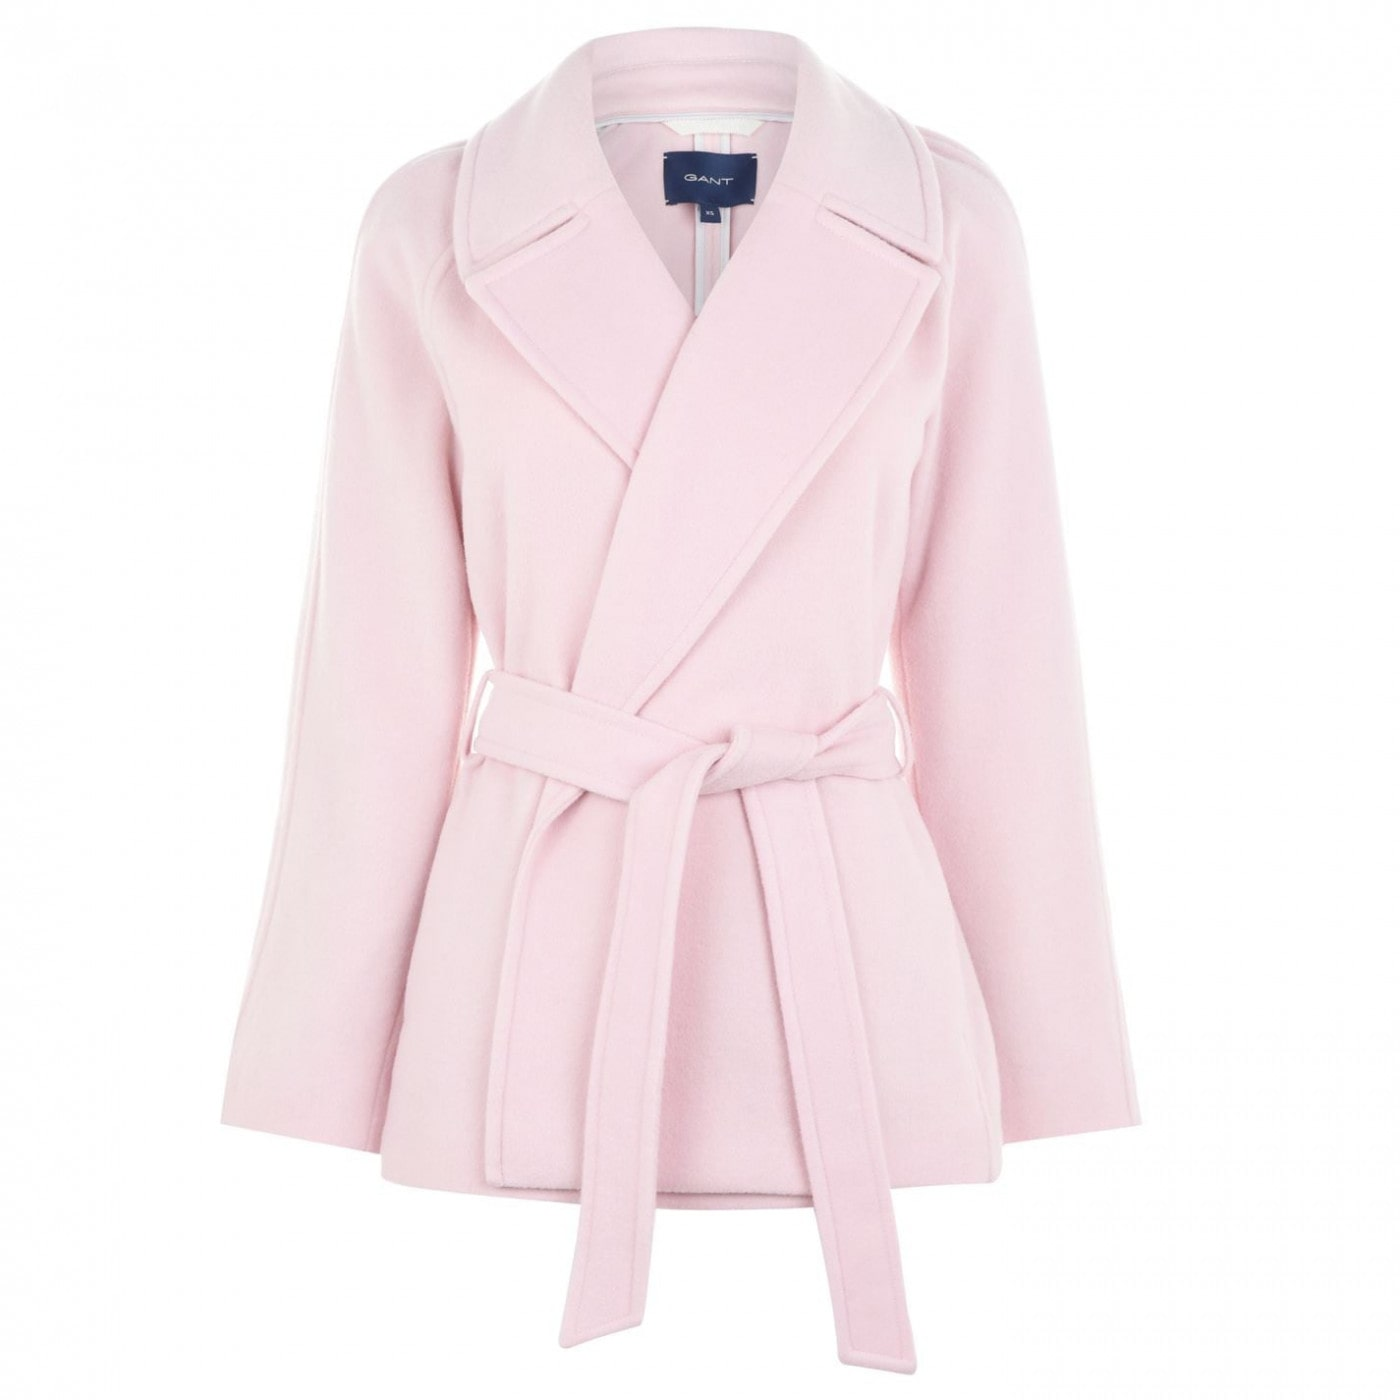 Gant Wool Wrap Jacket